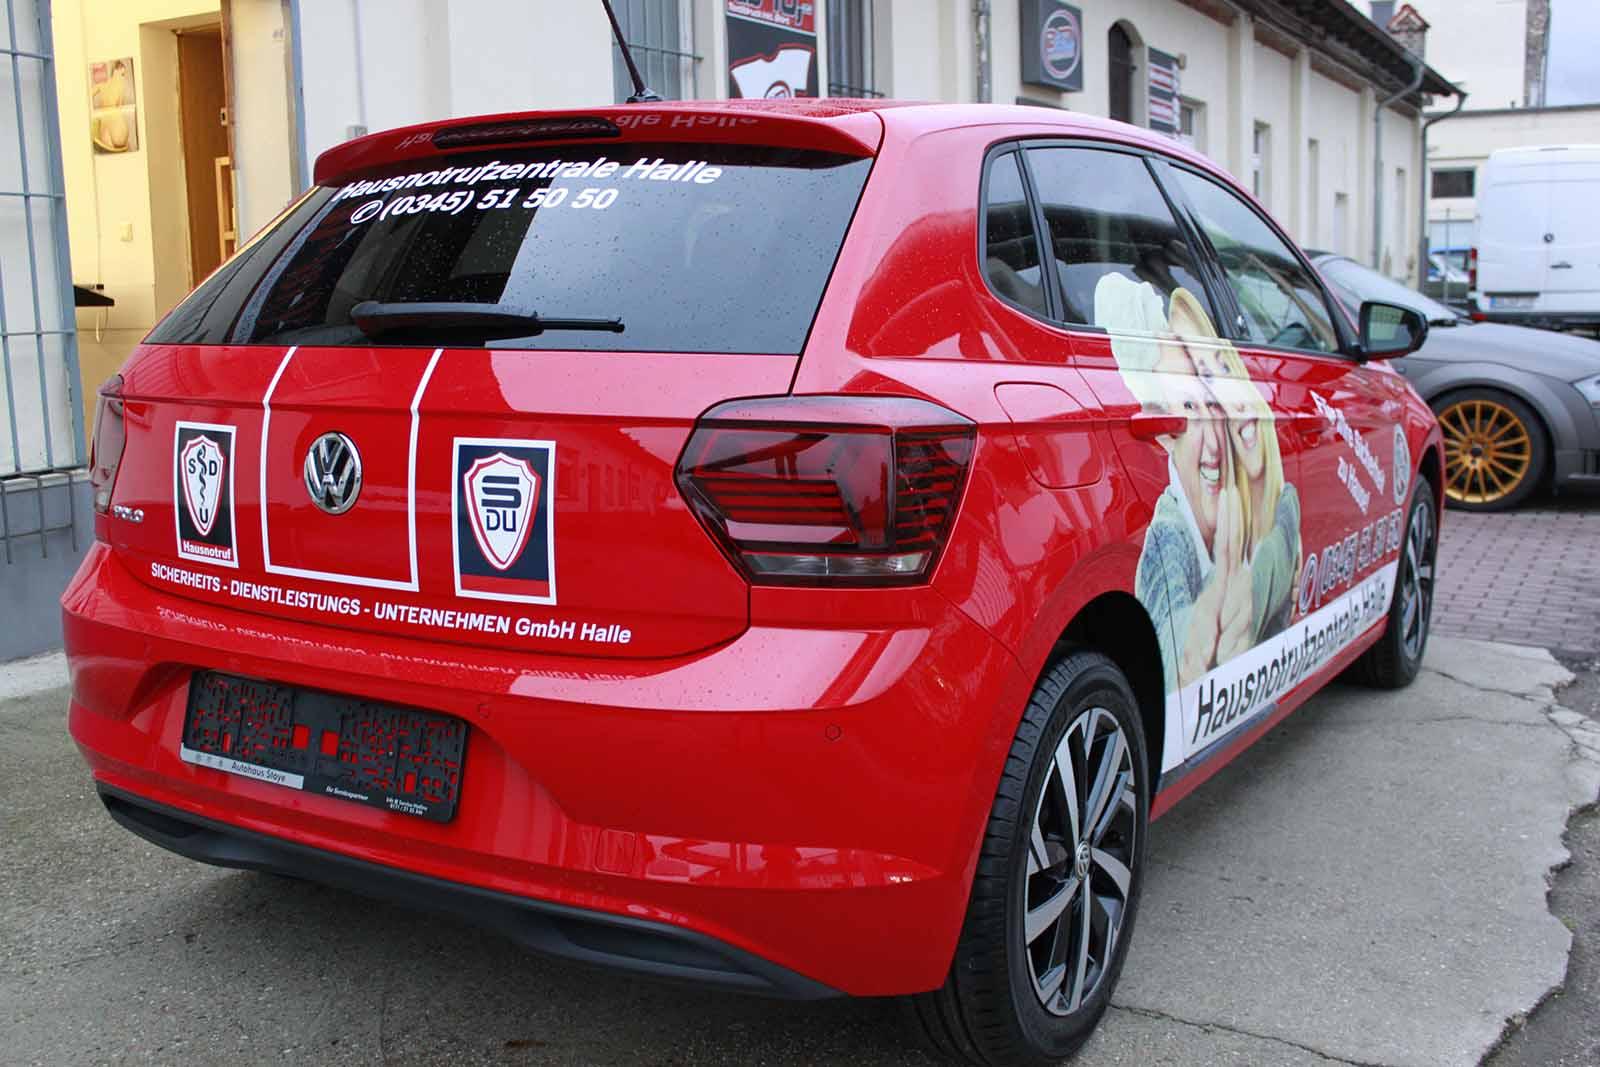 Fahrzeugwerbung, Fahrzeugbeschriftung, Auto folieren, Autowerbung VW Polo rot